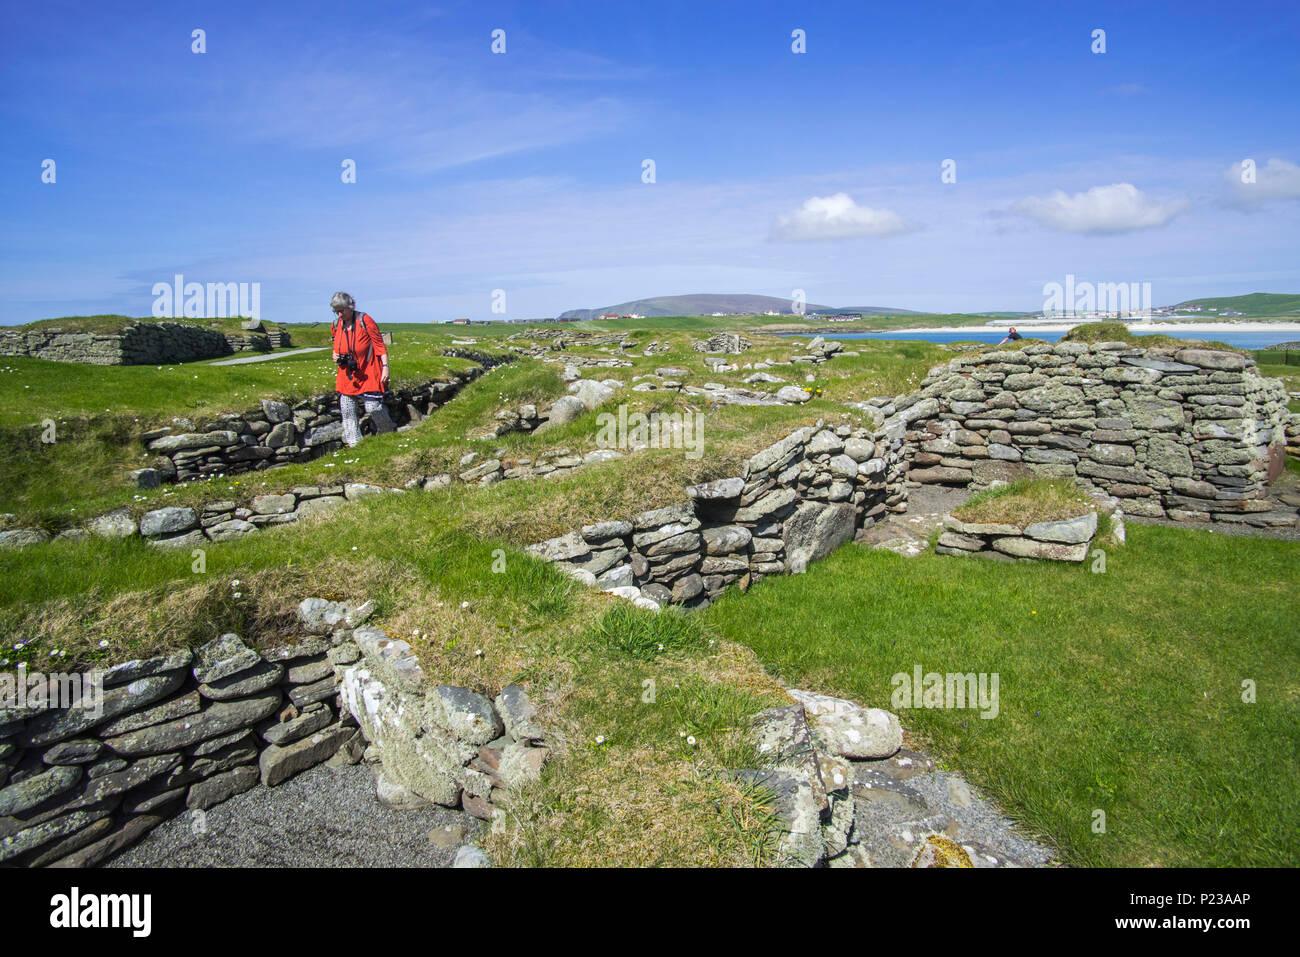 Tourist visiting Jarlshof, archaeological site showing 2500 BC prehistoric and Norse settlements at Sumburgh Head, Shetland Islands, Scotland, UK - Stock Image